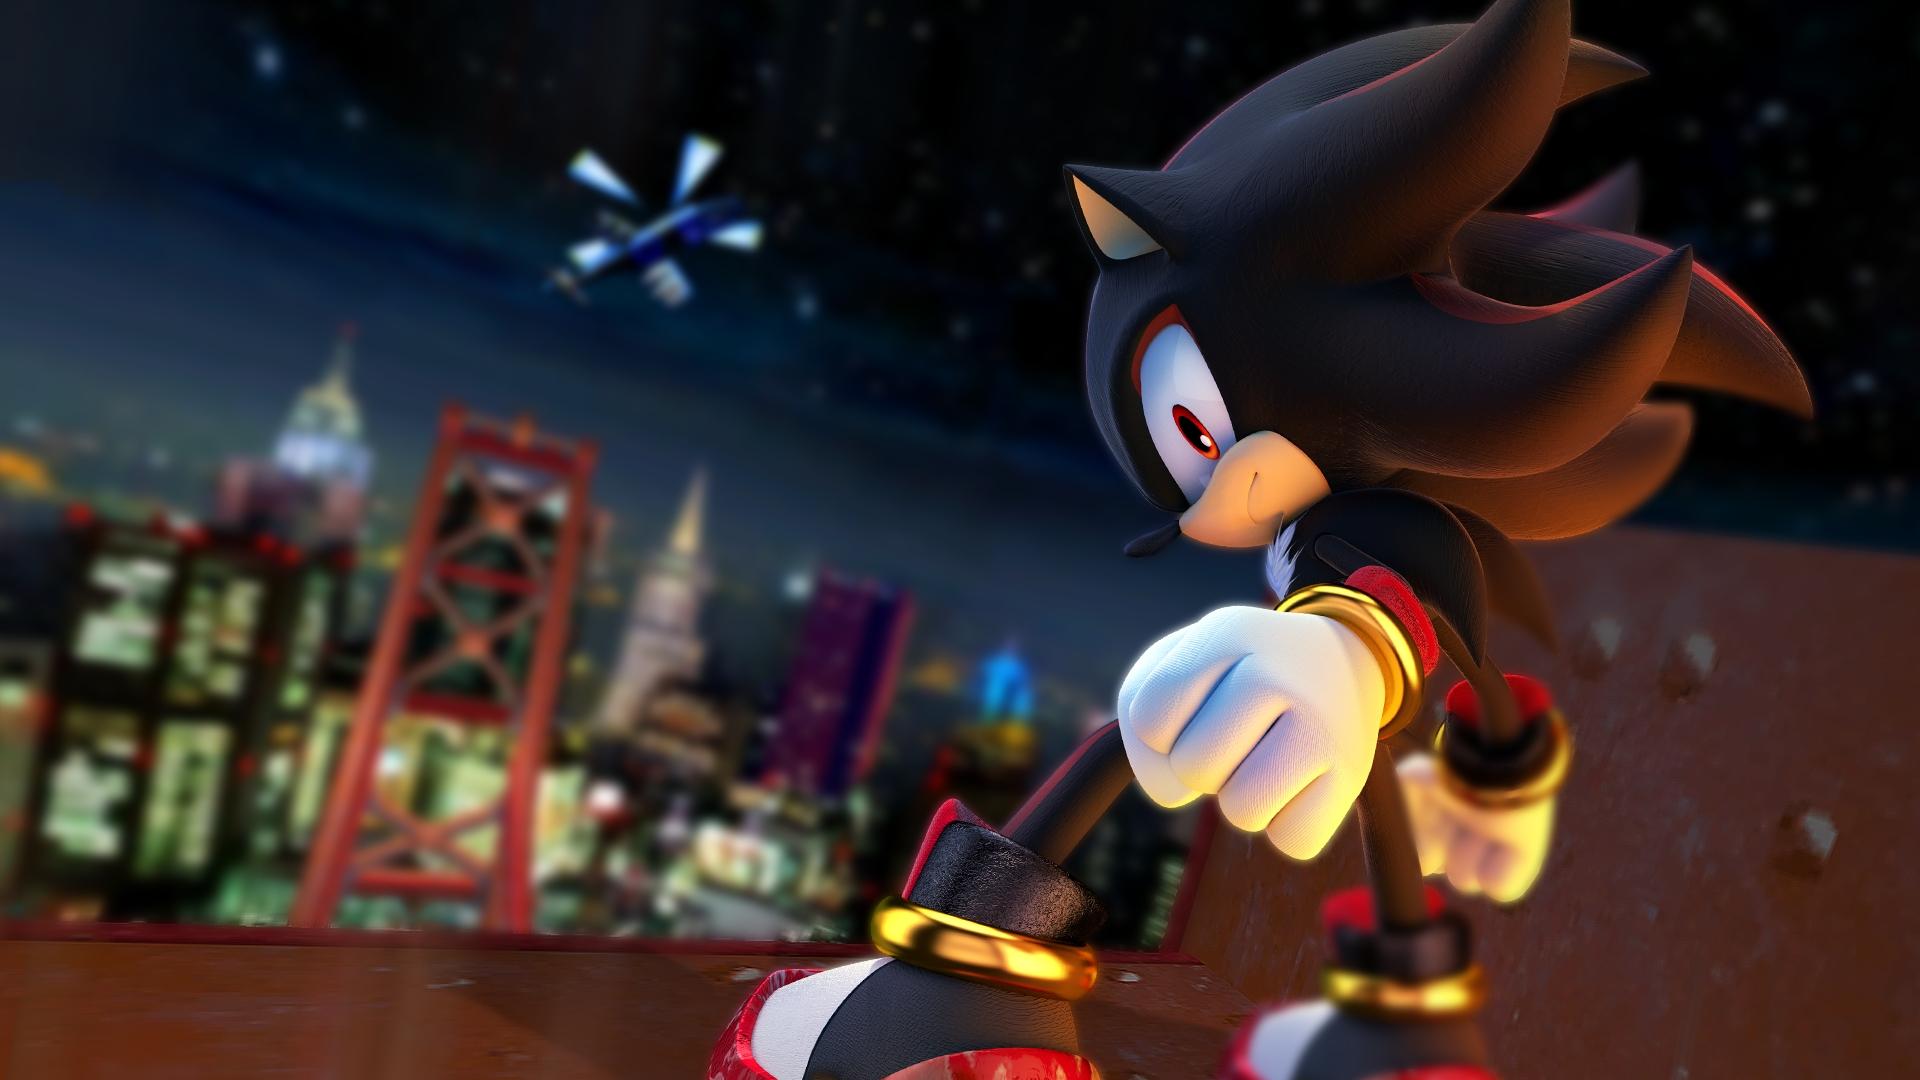 shadow-the-hedgehog full hd fond d'écran and arrière-plan